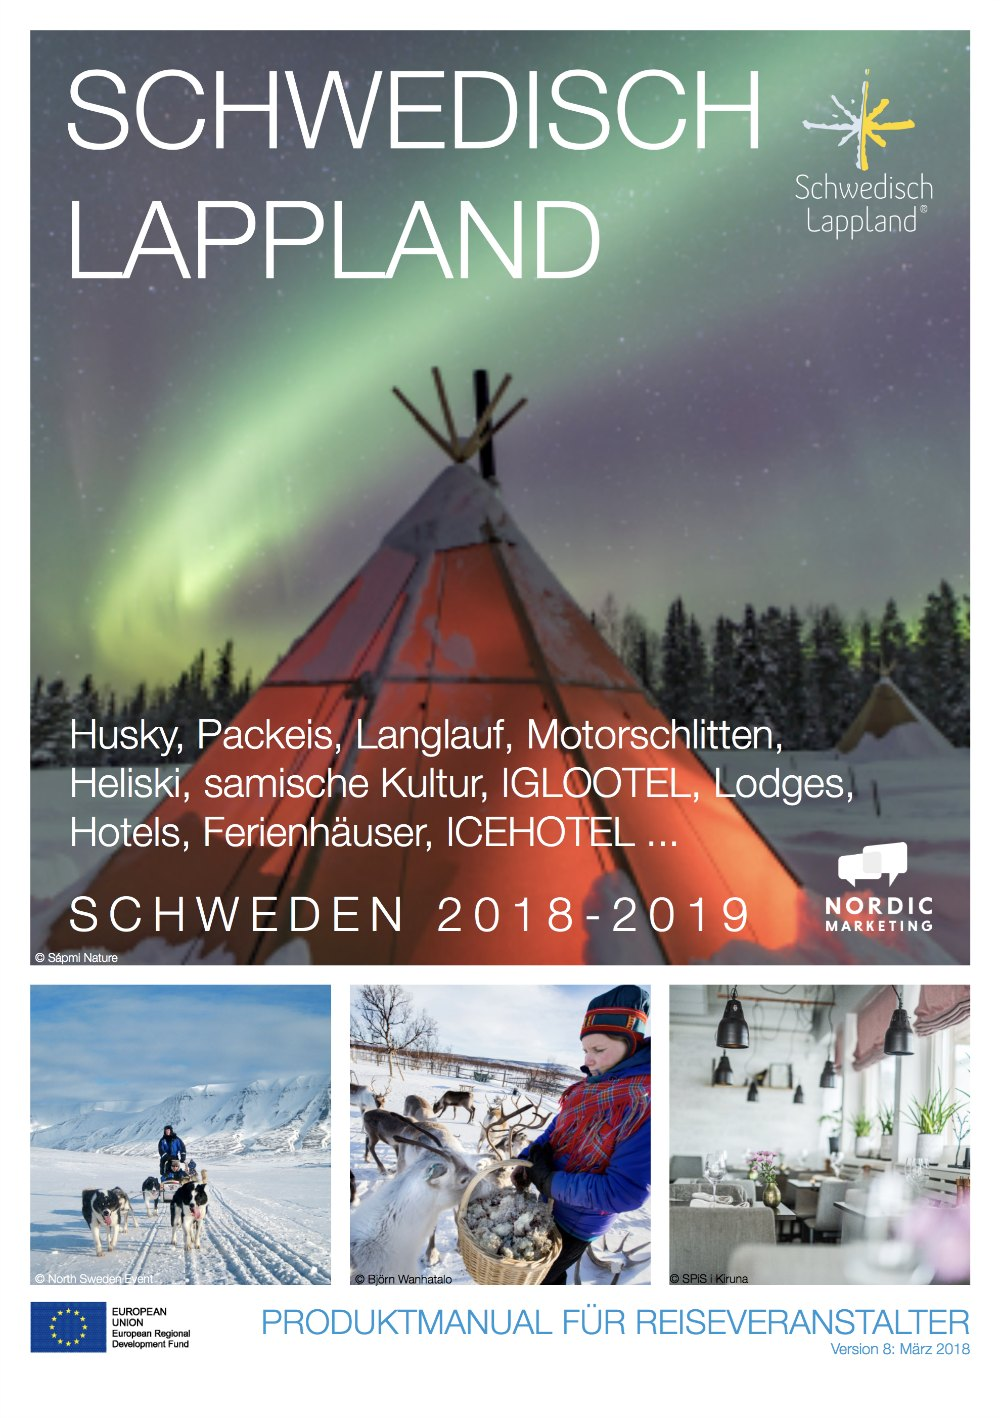 Produktmanual Schwedisch Lappland Winter 2018-2019